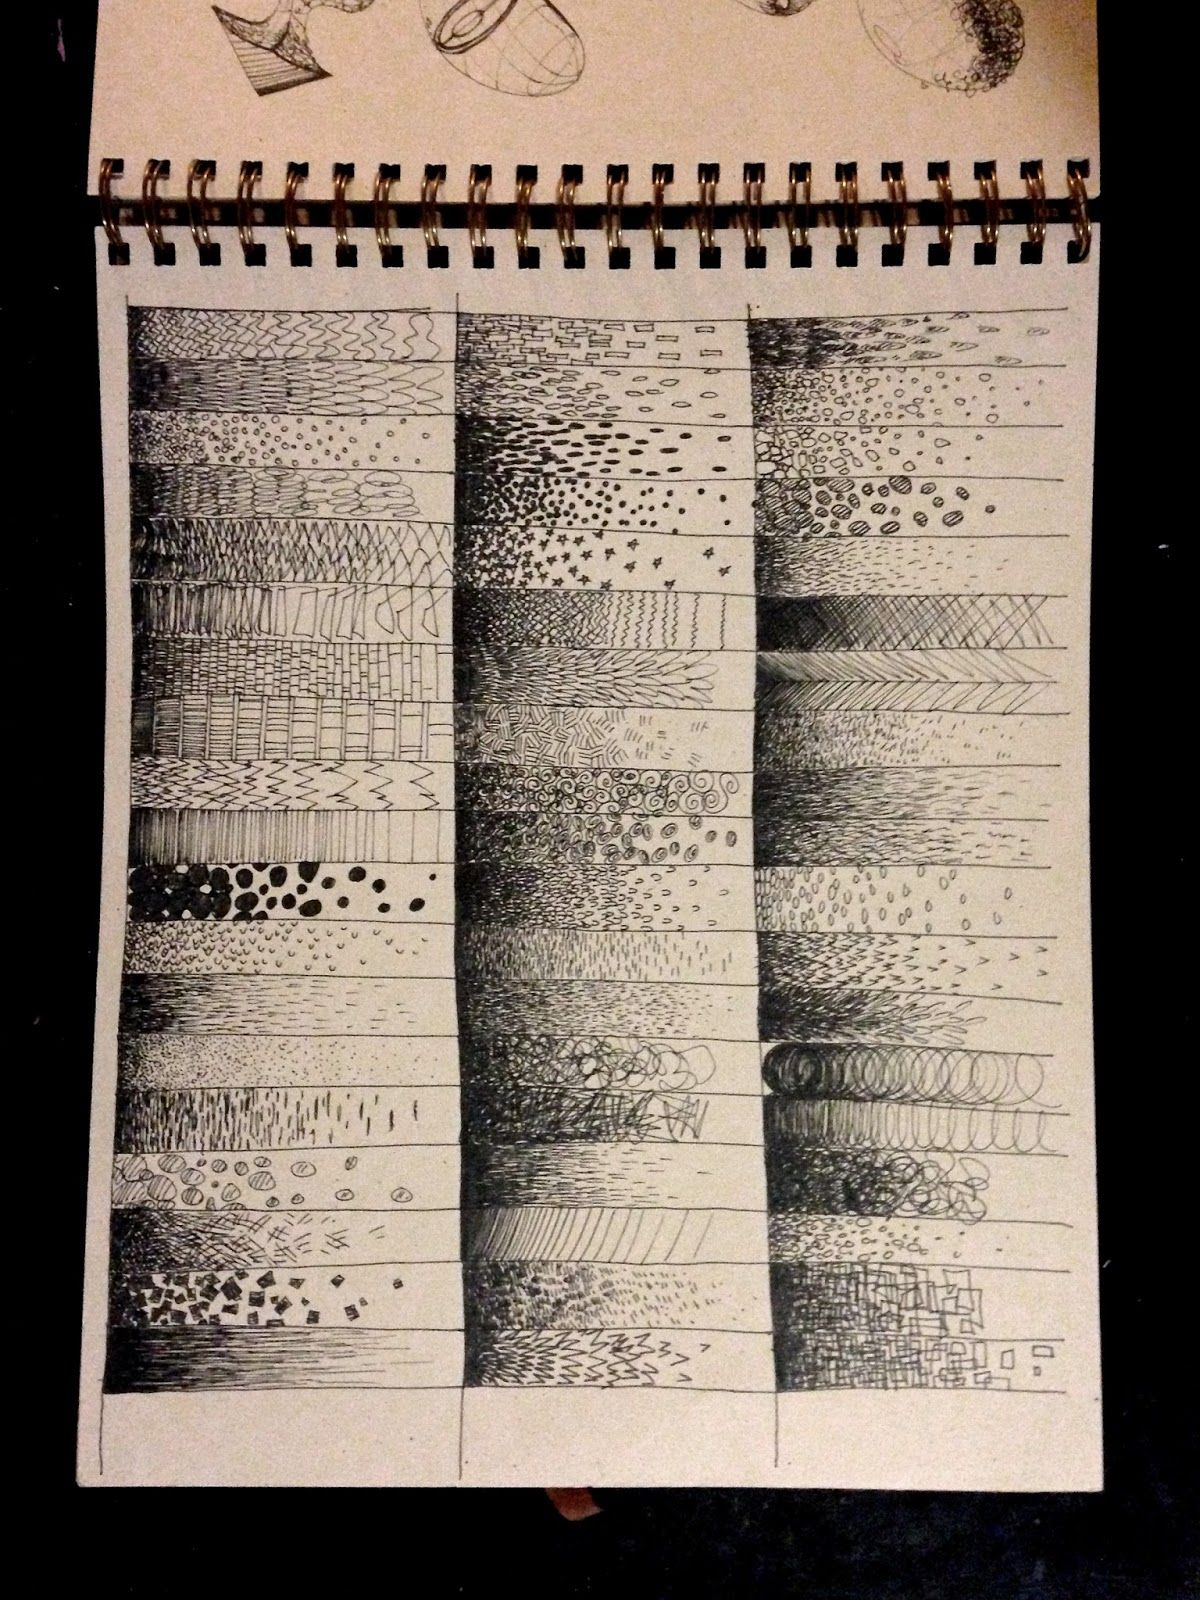 Griselda Sastrawinata Tuesday Tips Drawing With Pen